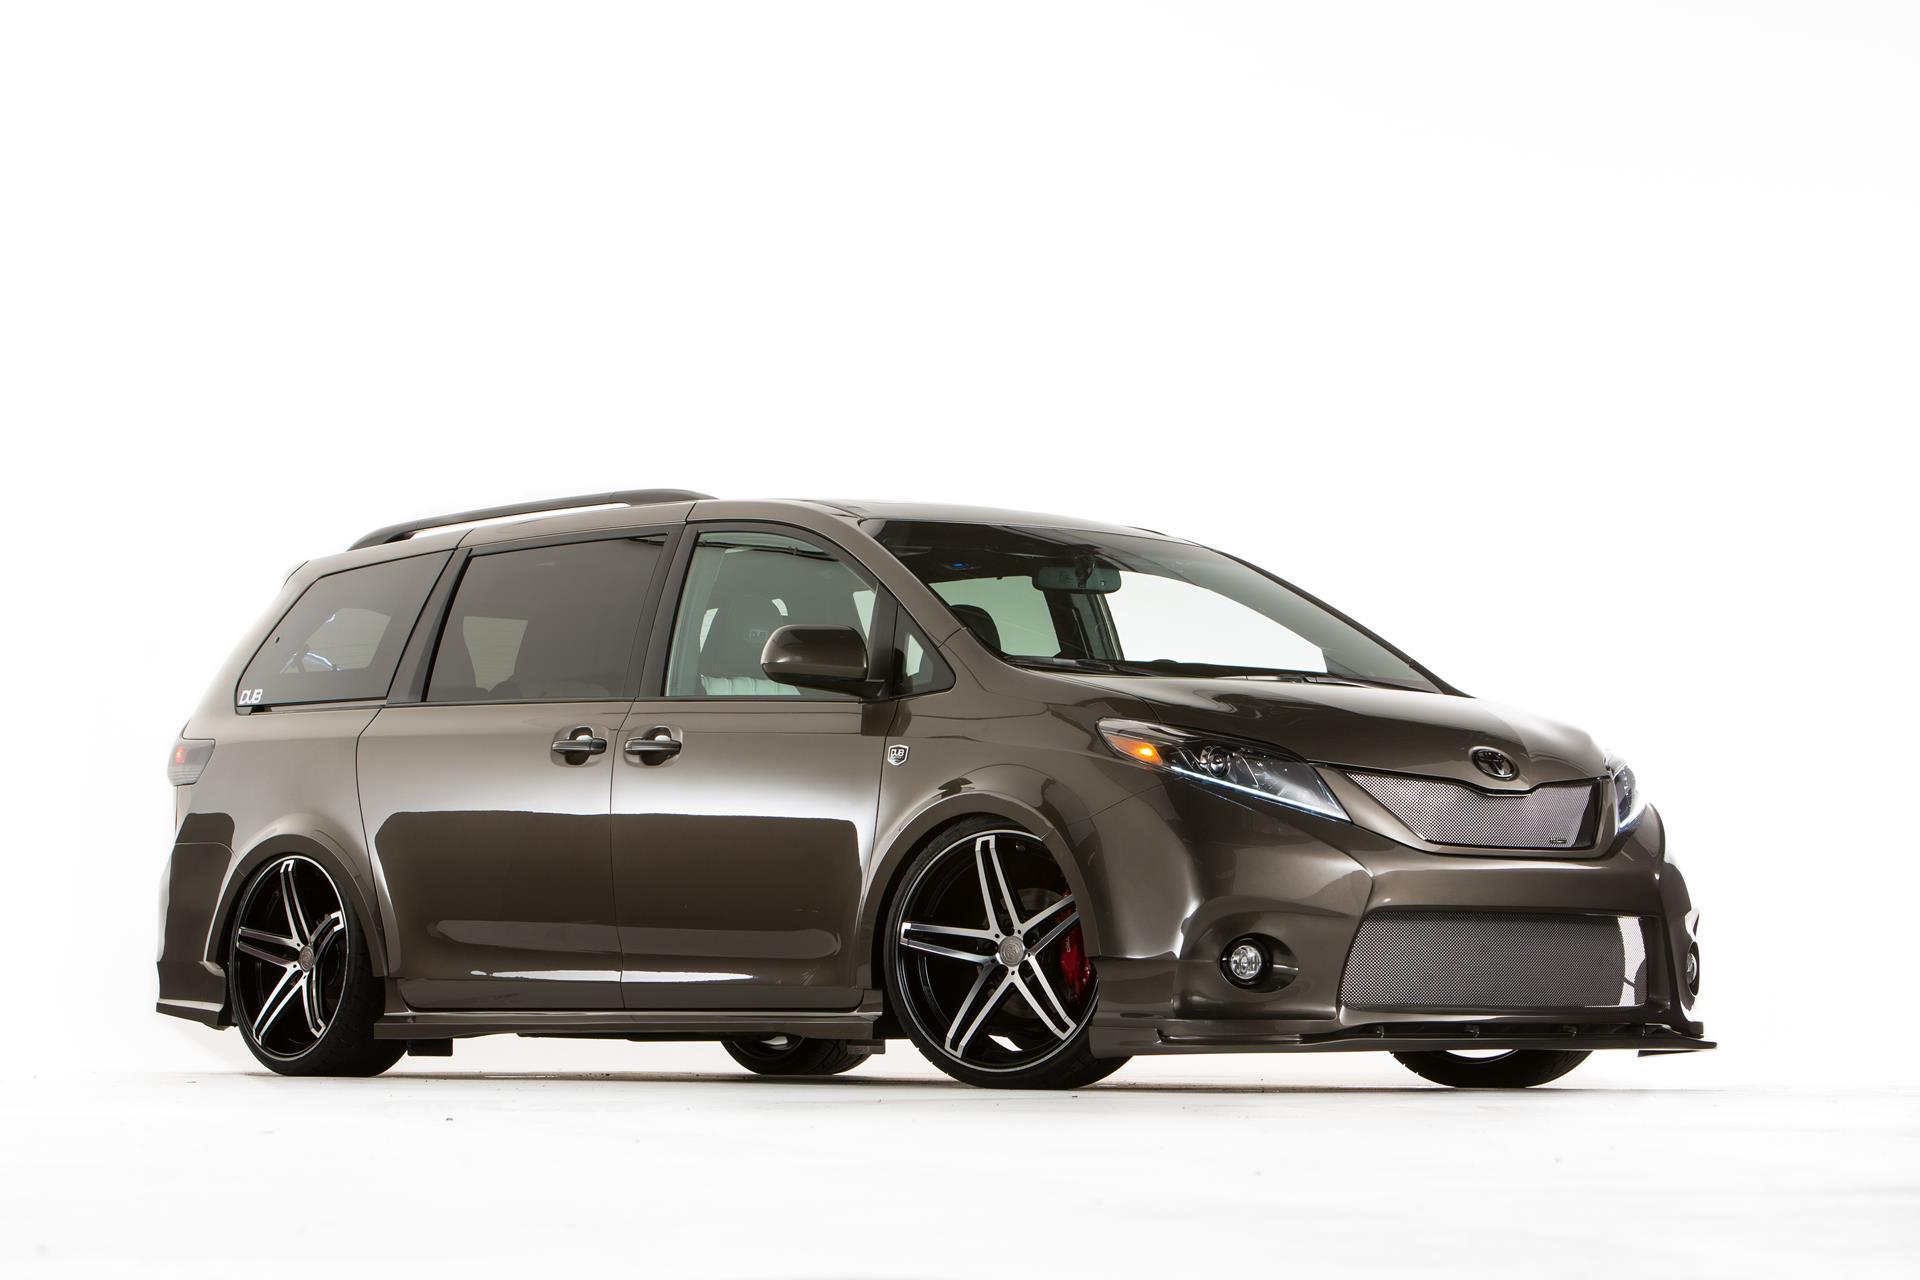 Sienna Hybrid >> 2014 Toyota Sienna DUB Edition News and Information